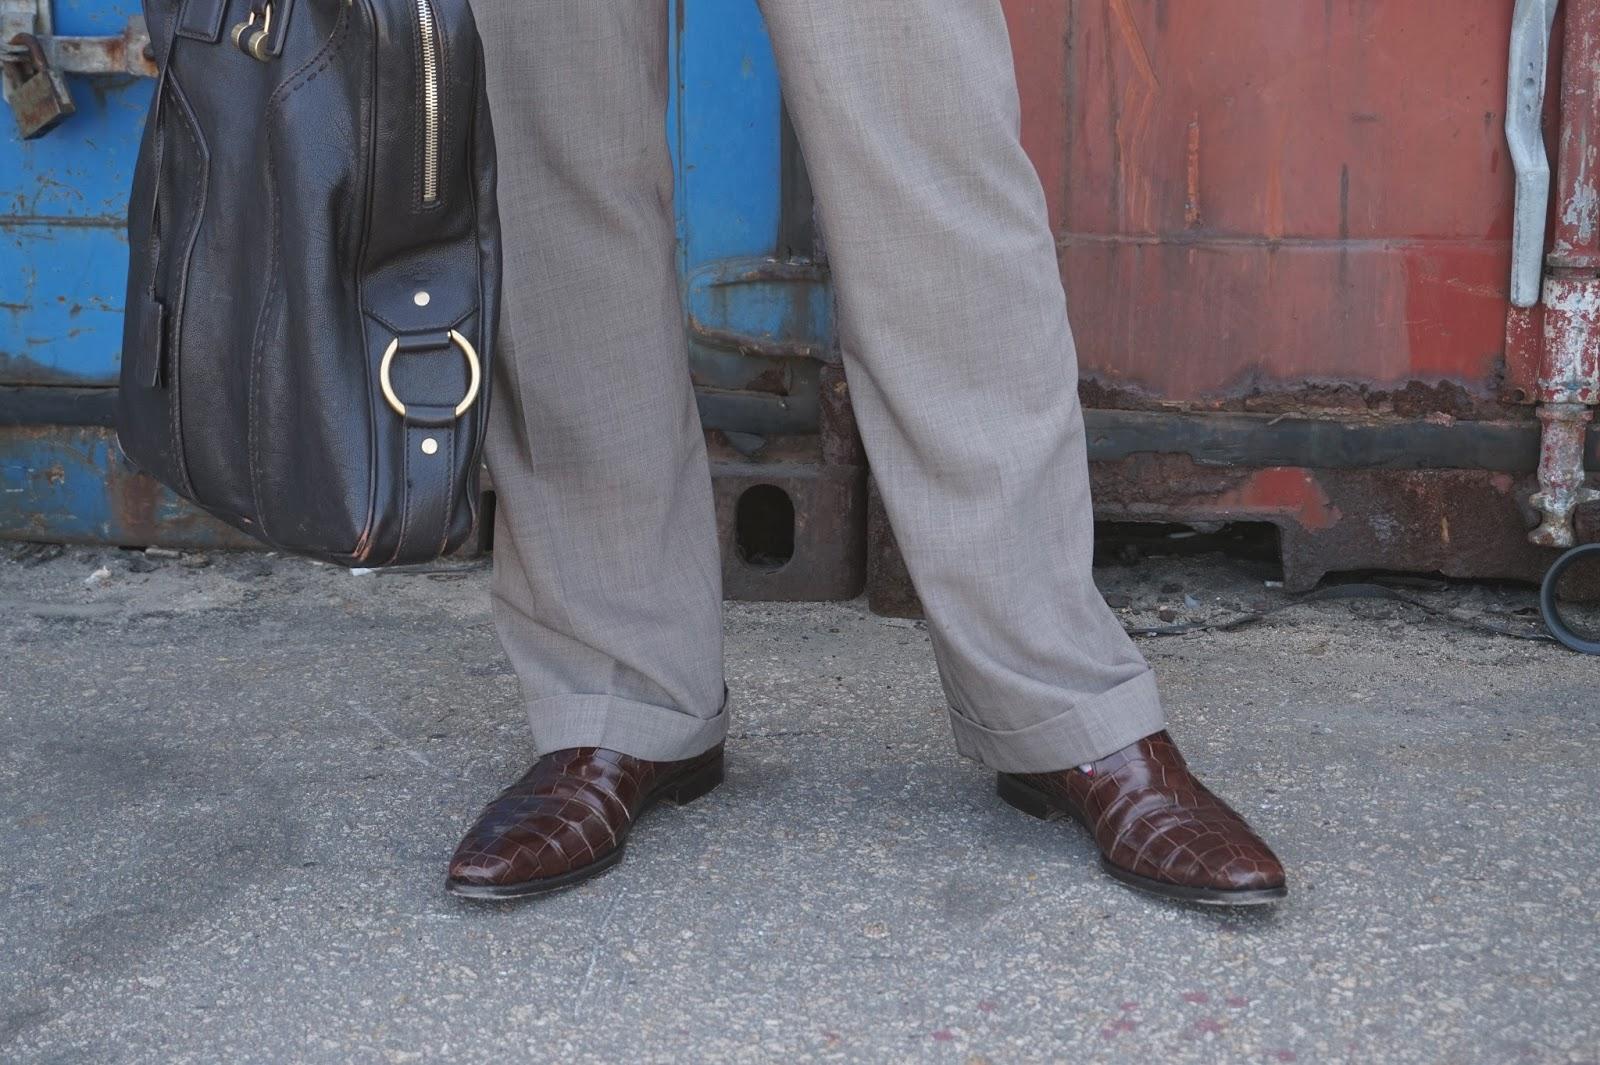 Watsons Winter Wednesday Brown Suit tie shirt professional work clothes men gentlemen bag briefcase Ferragamo leather shoes